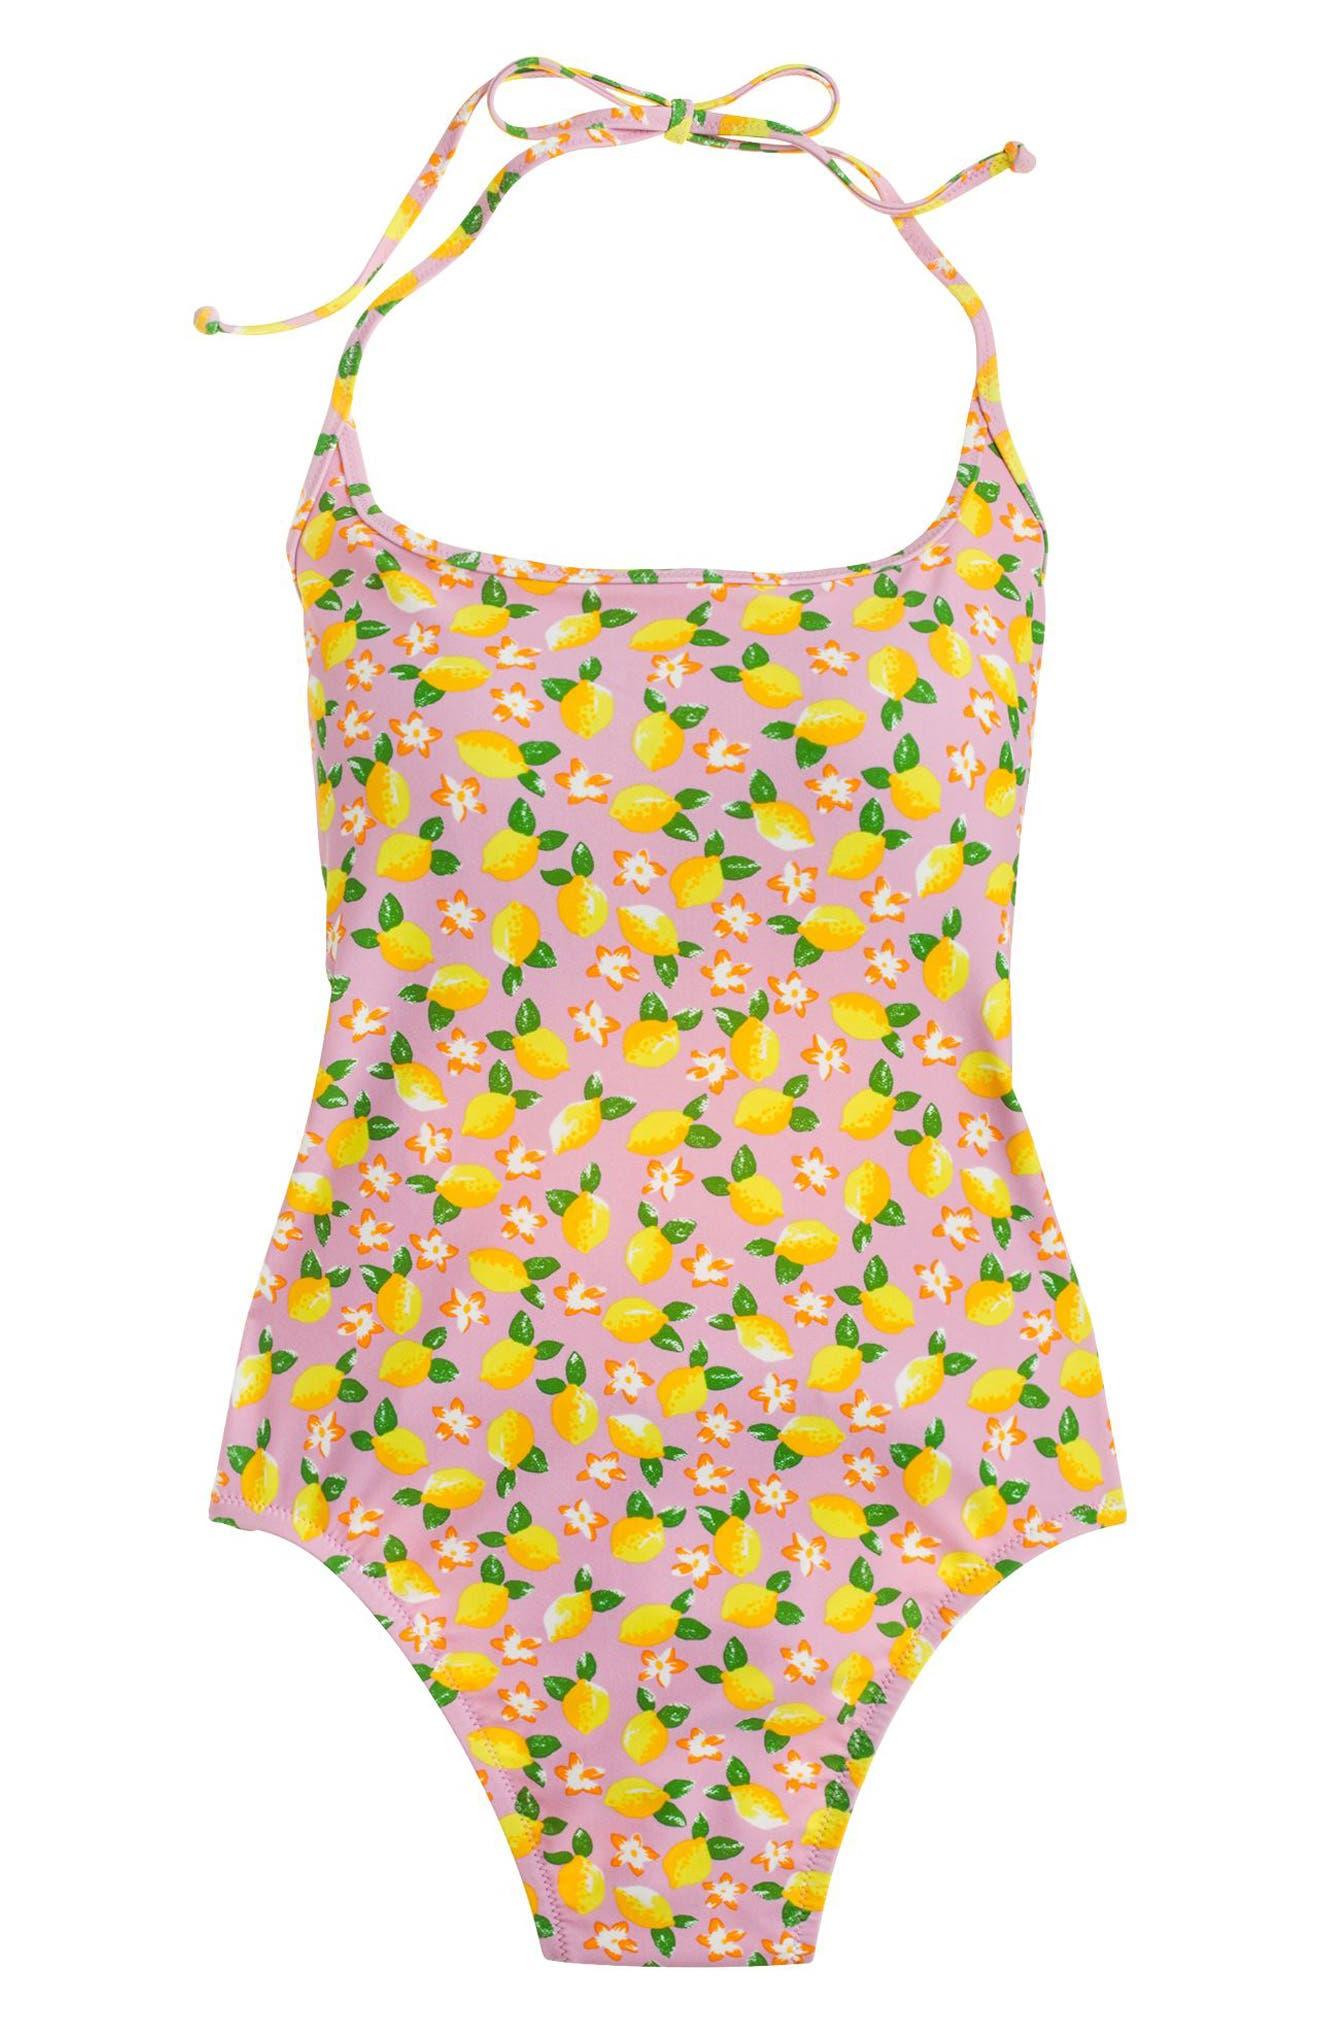 J.Crew Lemon Print One-Piece Swimsuit,                             Alternate thumbnail 4, color,                             Lemon Multi